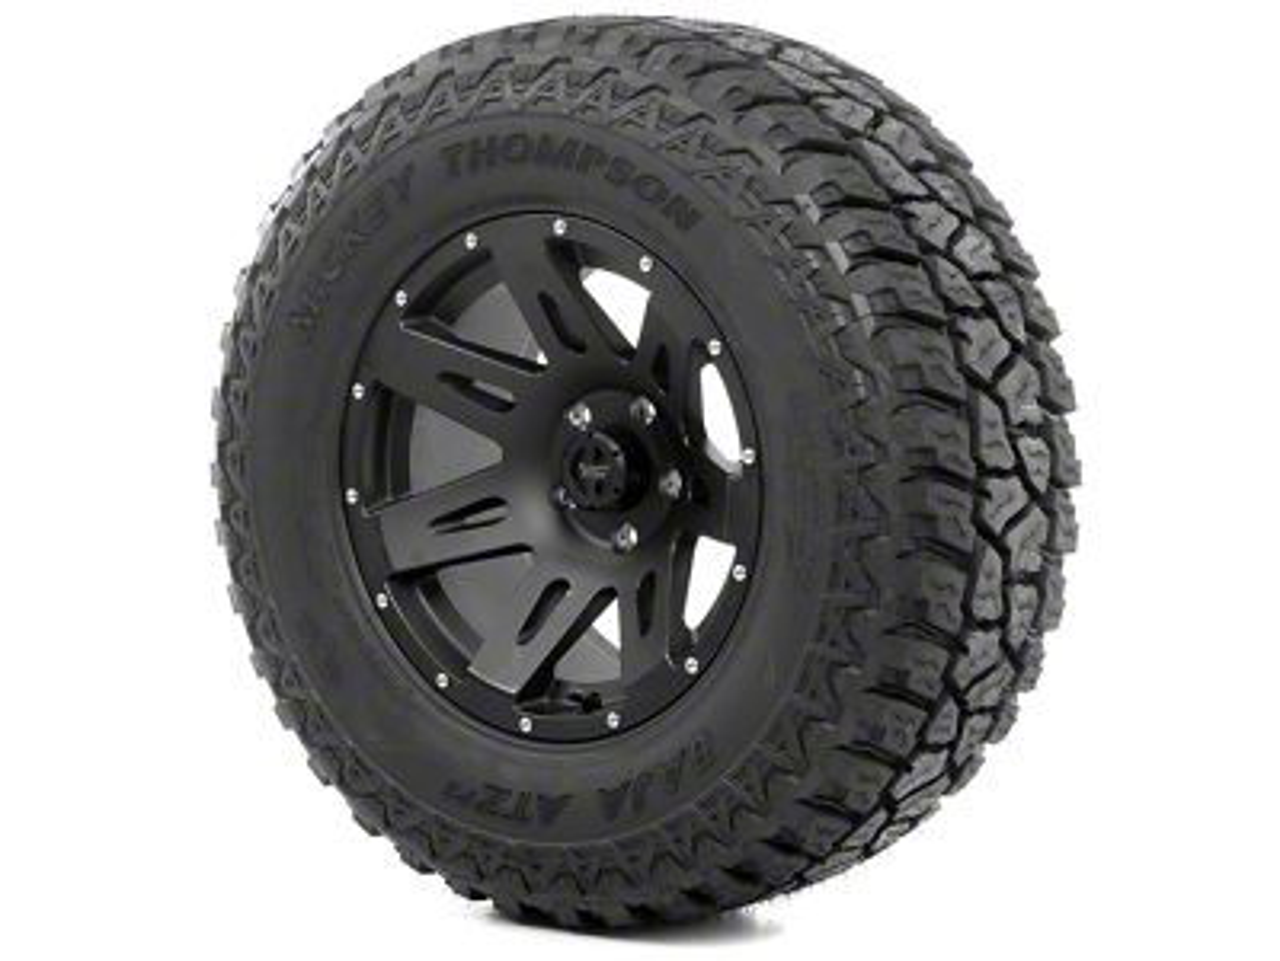 Rugged Ridge XHD Wheel 18x9 Black Satin and Mickey Thompson ATZ P3 305/60R18 Wheel - Tire Kit (13-18 Jeep Wrangler JK; 2018 Jeep Wrangler JL)